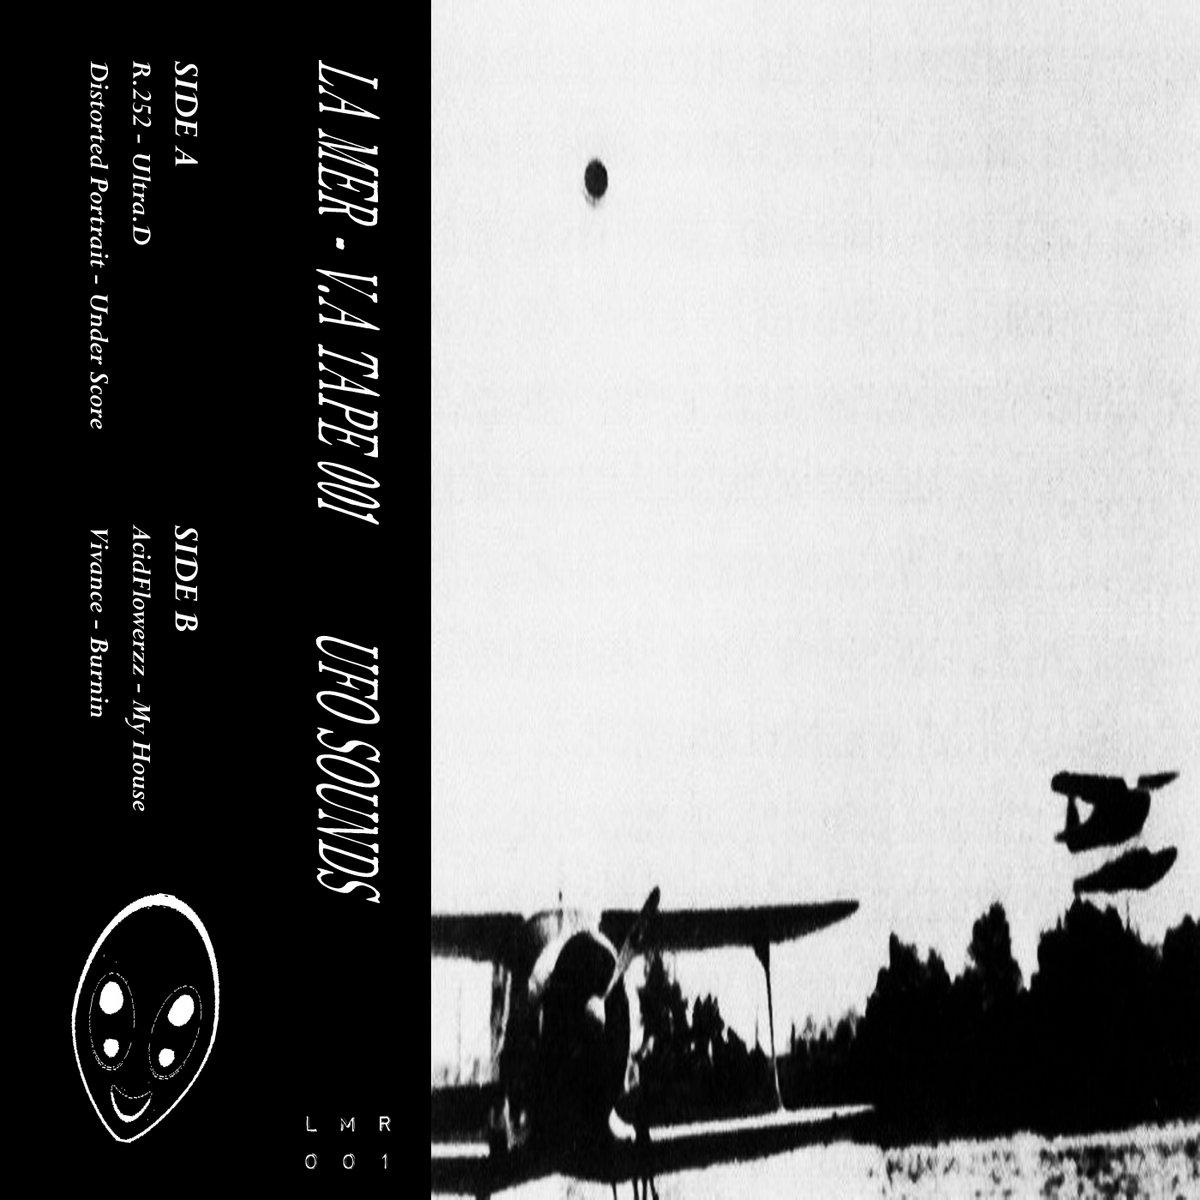 LMR001 - UFO Sounds